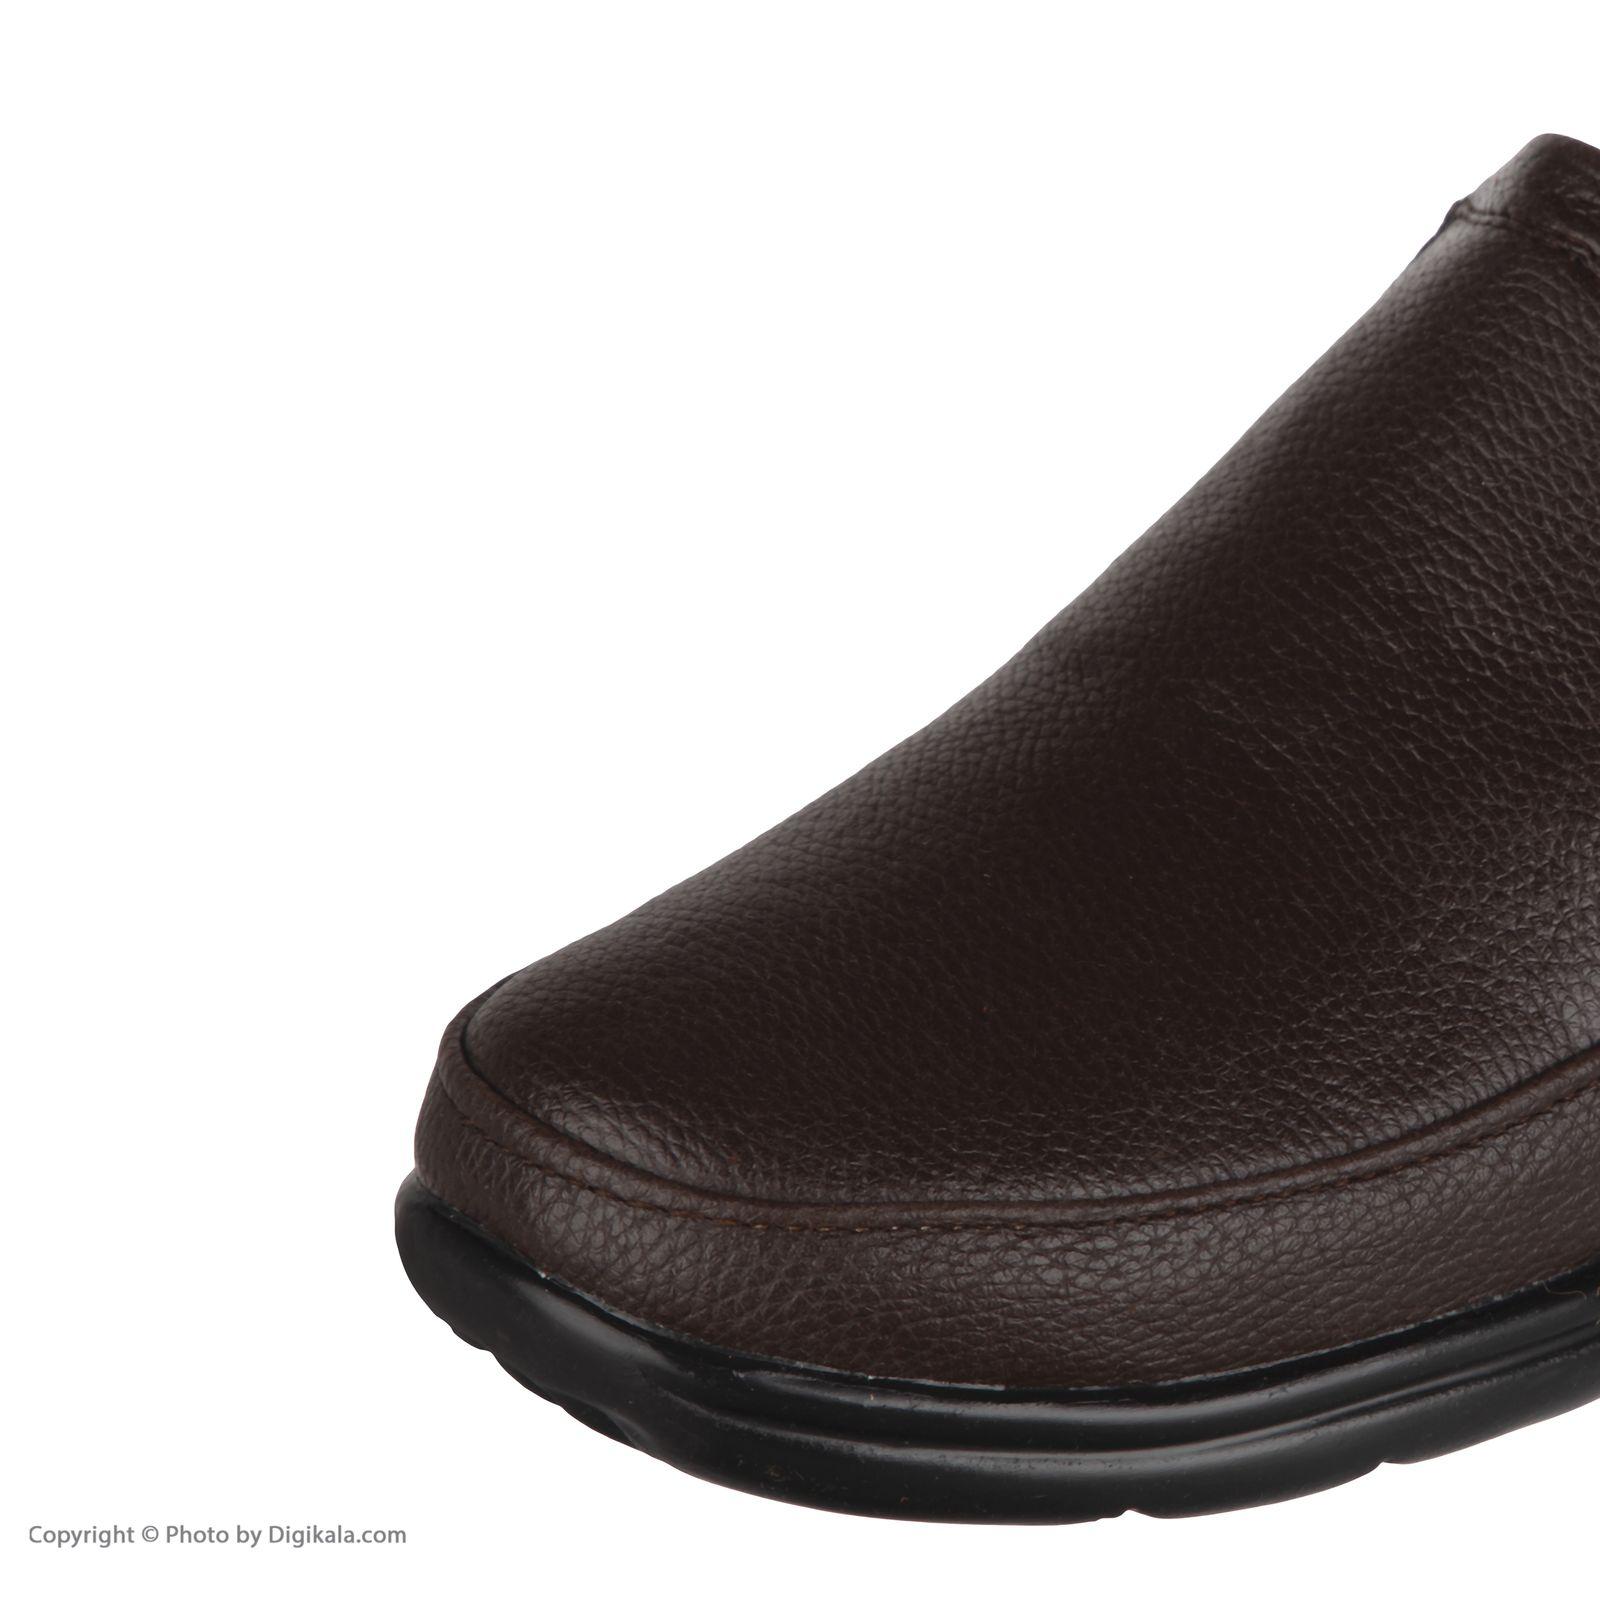 کفش روزمره مردانه مدل k.baz.073 -  - 8